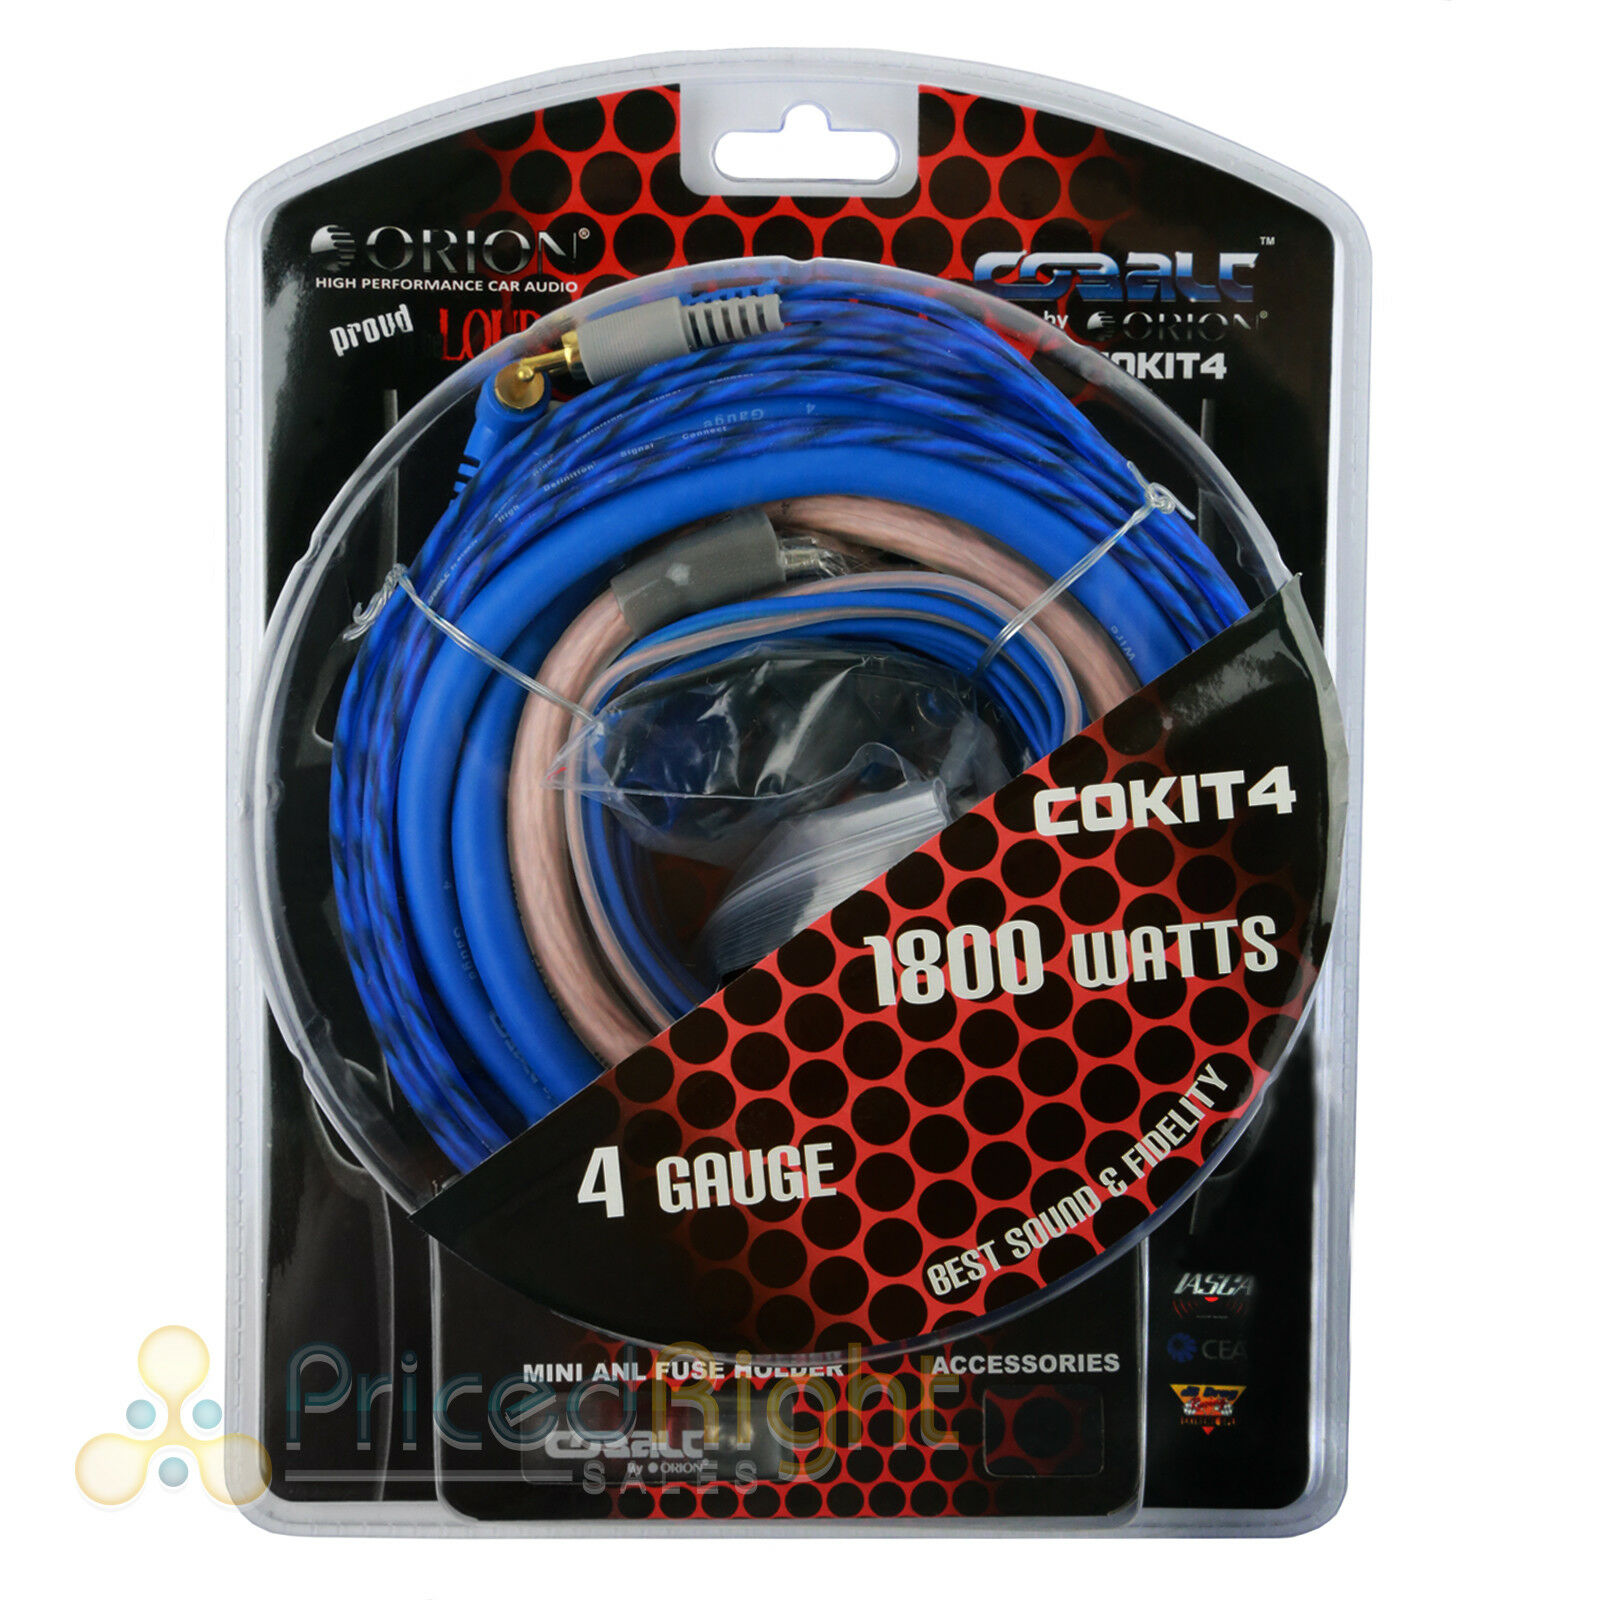 Cobalt ORION Complete Amplifier Kit 4 Gauge COKIT4 | eBay